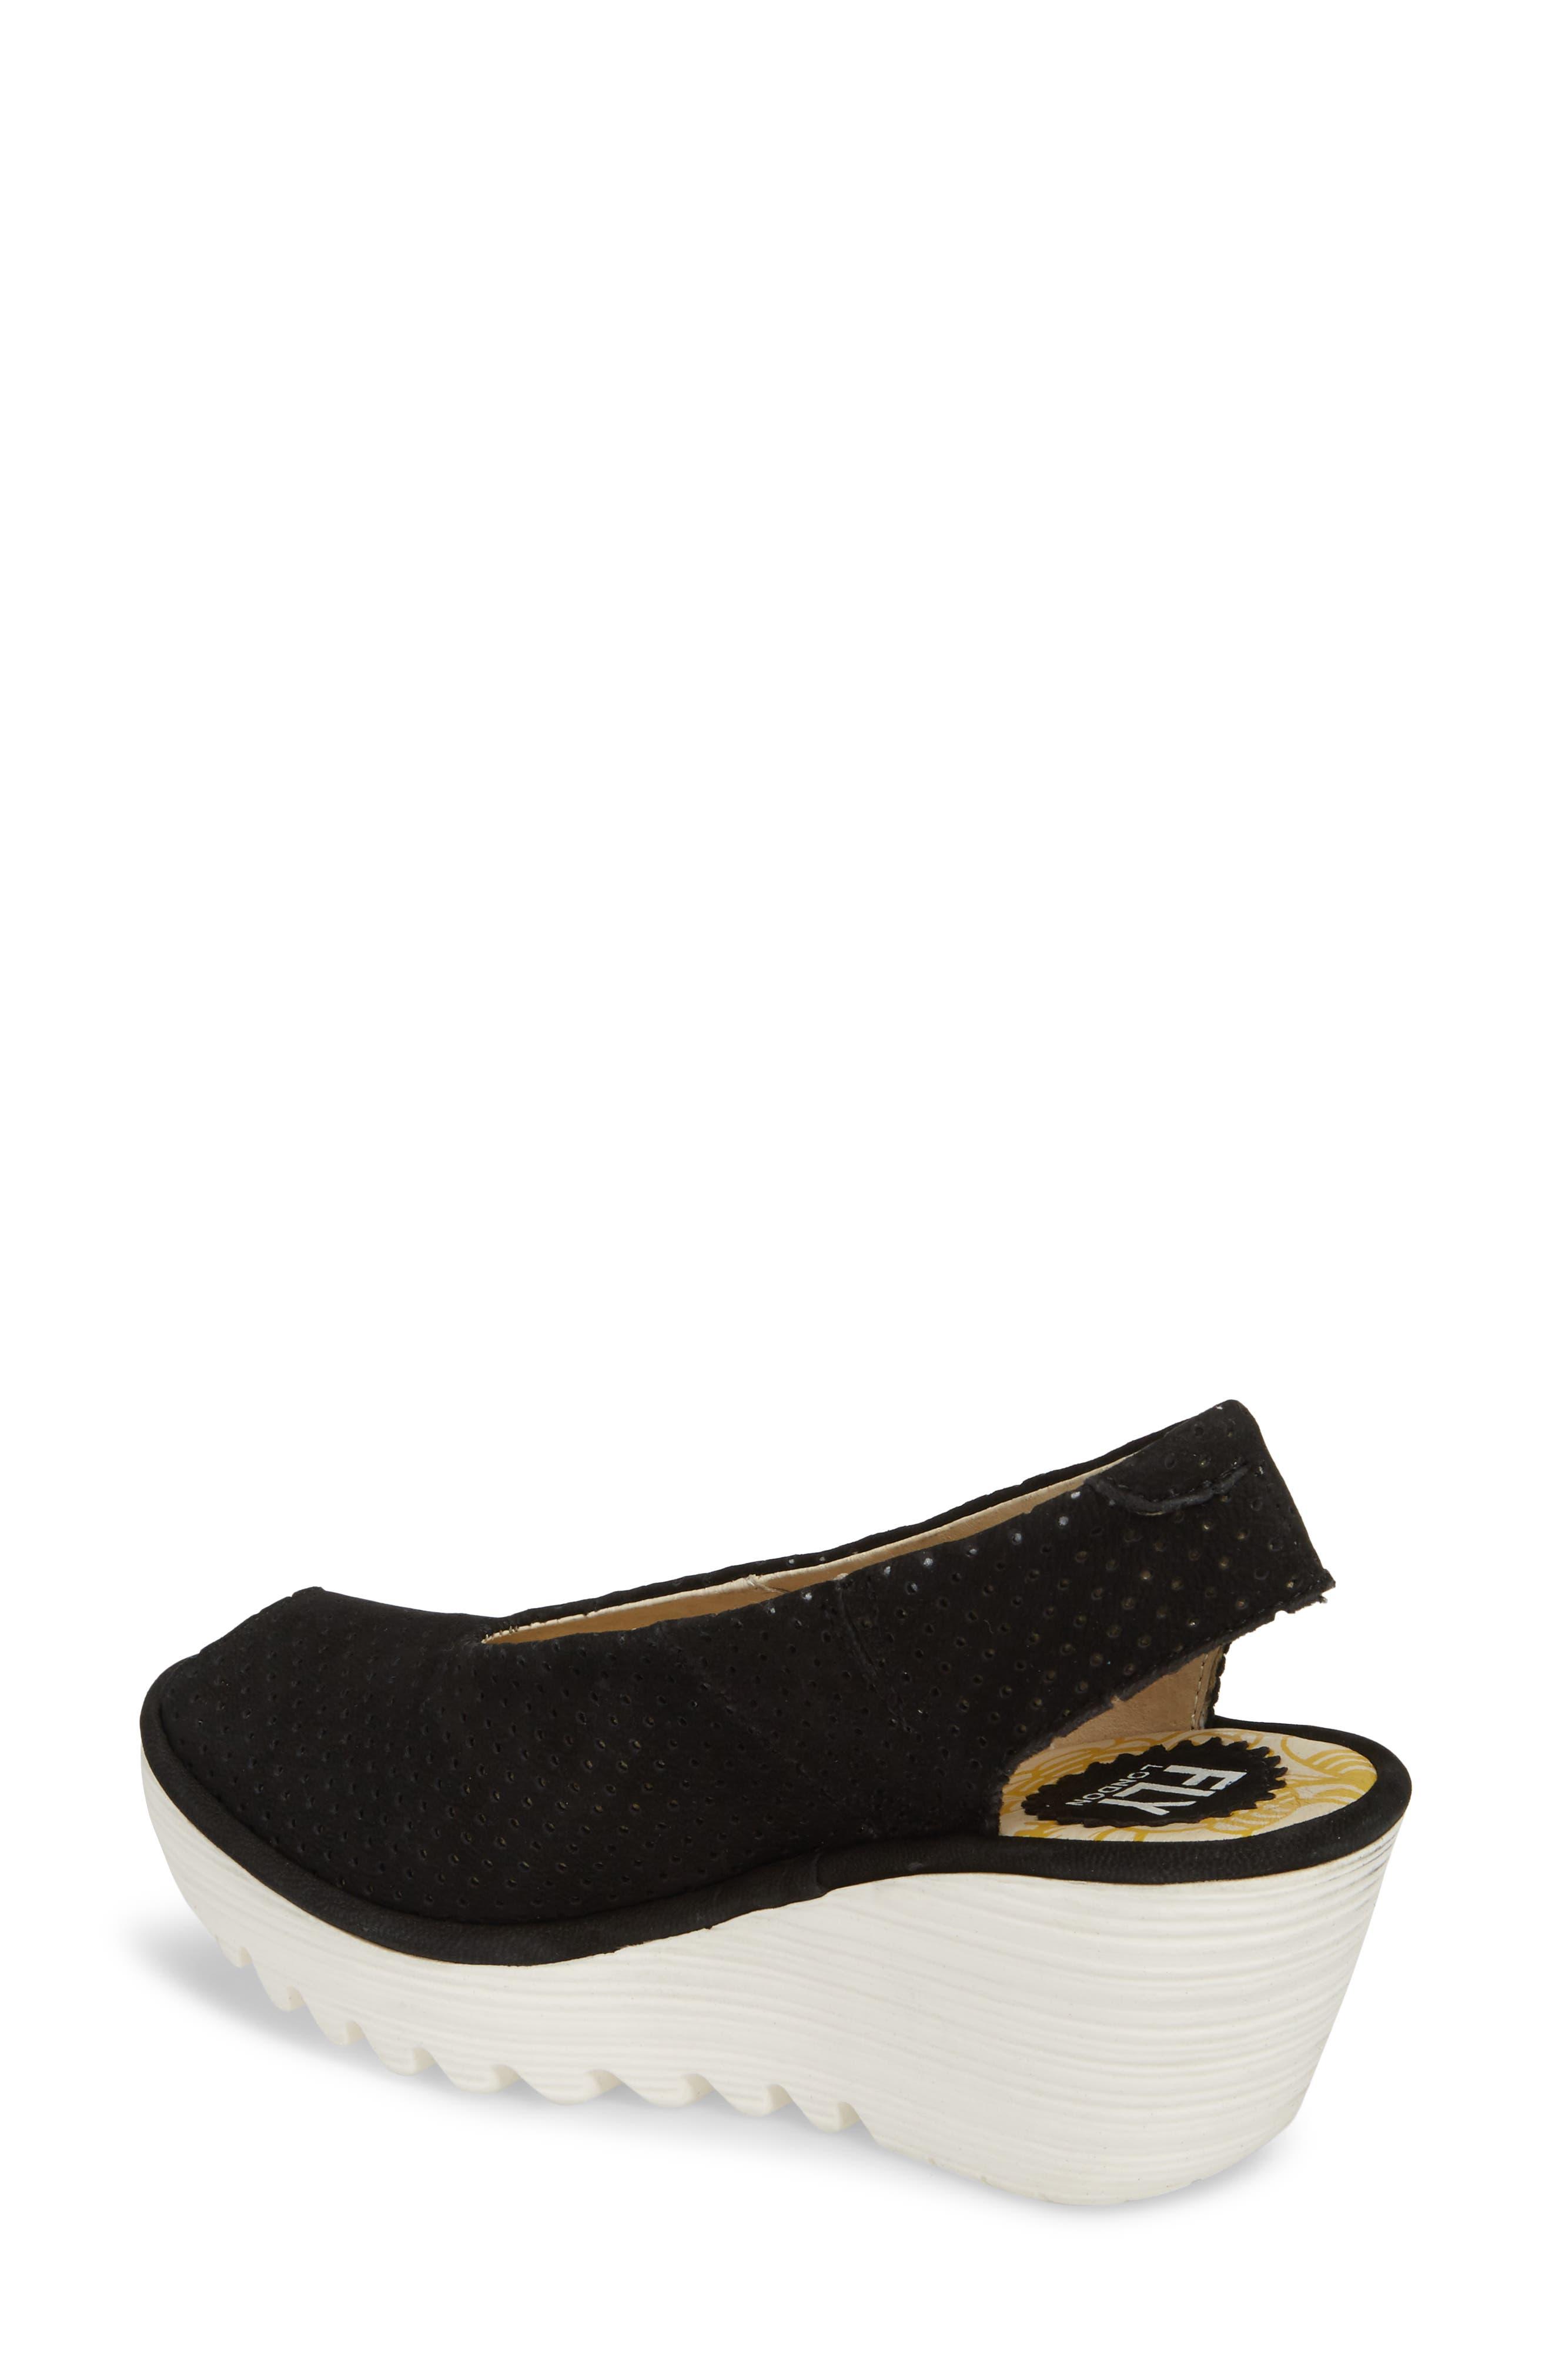 Yazu Wedge Sandal,                             Alternate thumbnail 2, color,                             BLACK/ BLACK LEATHER